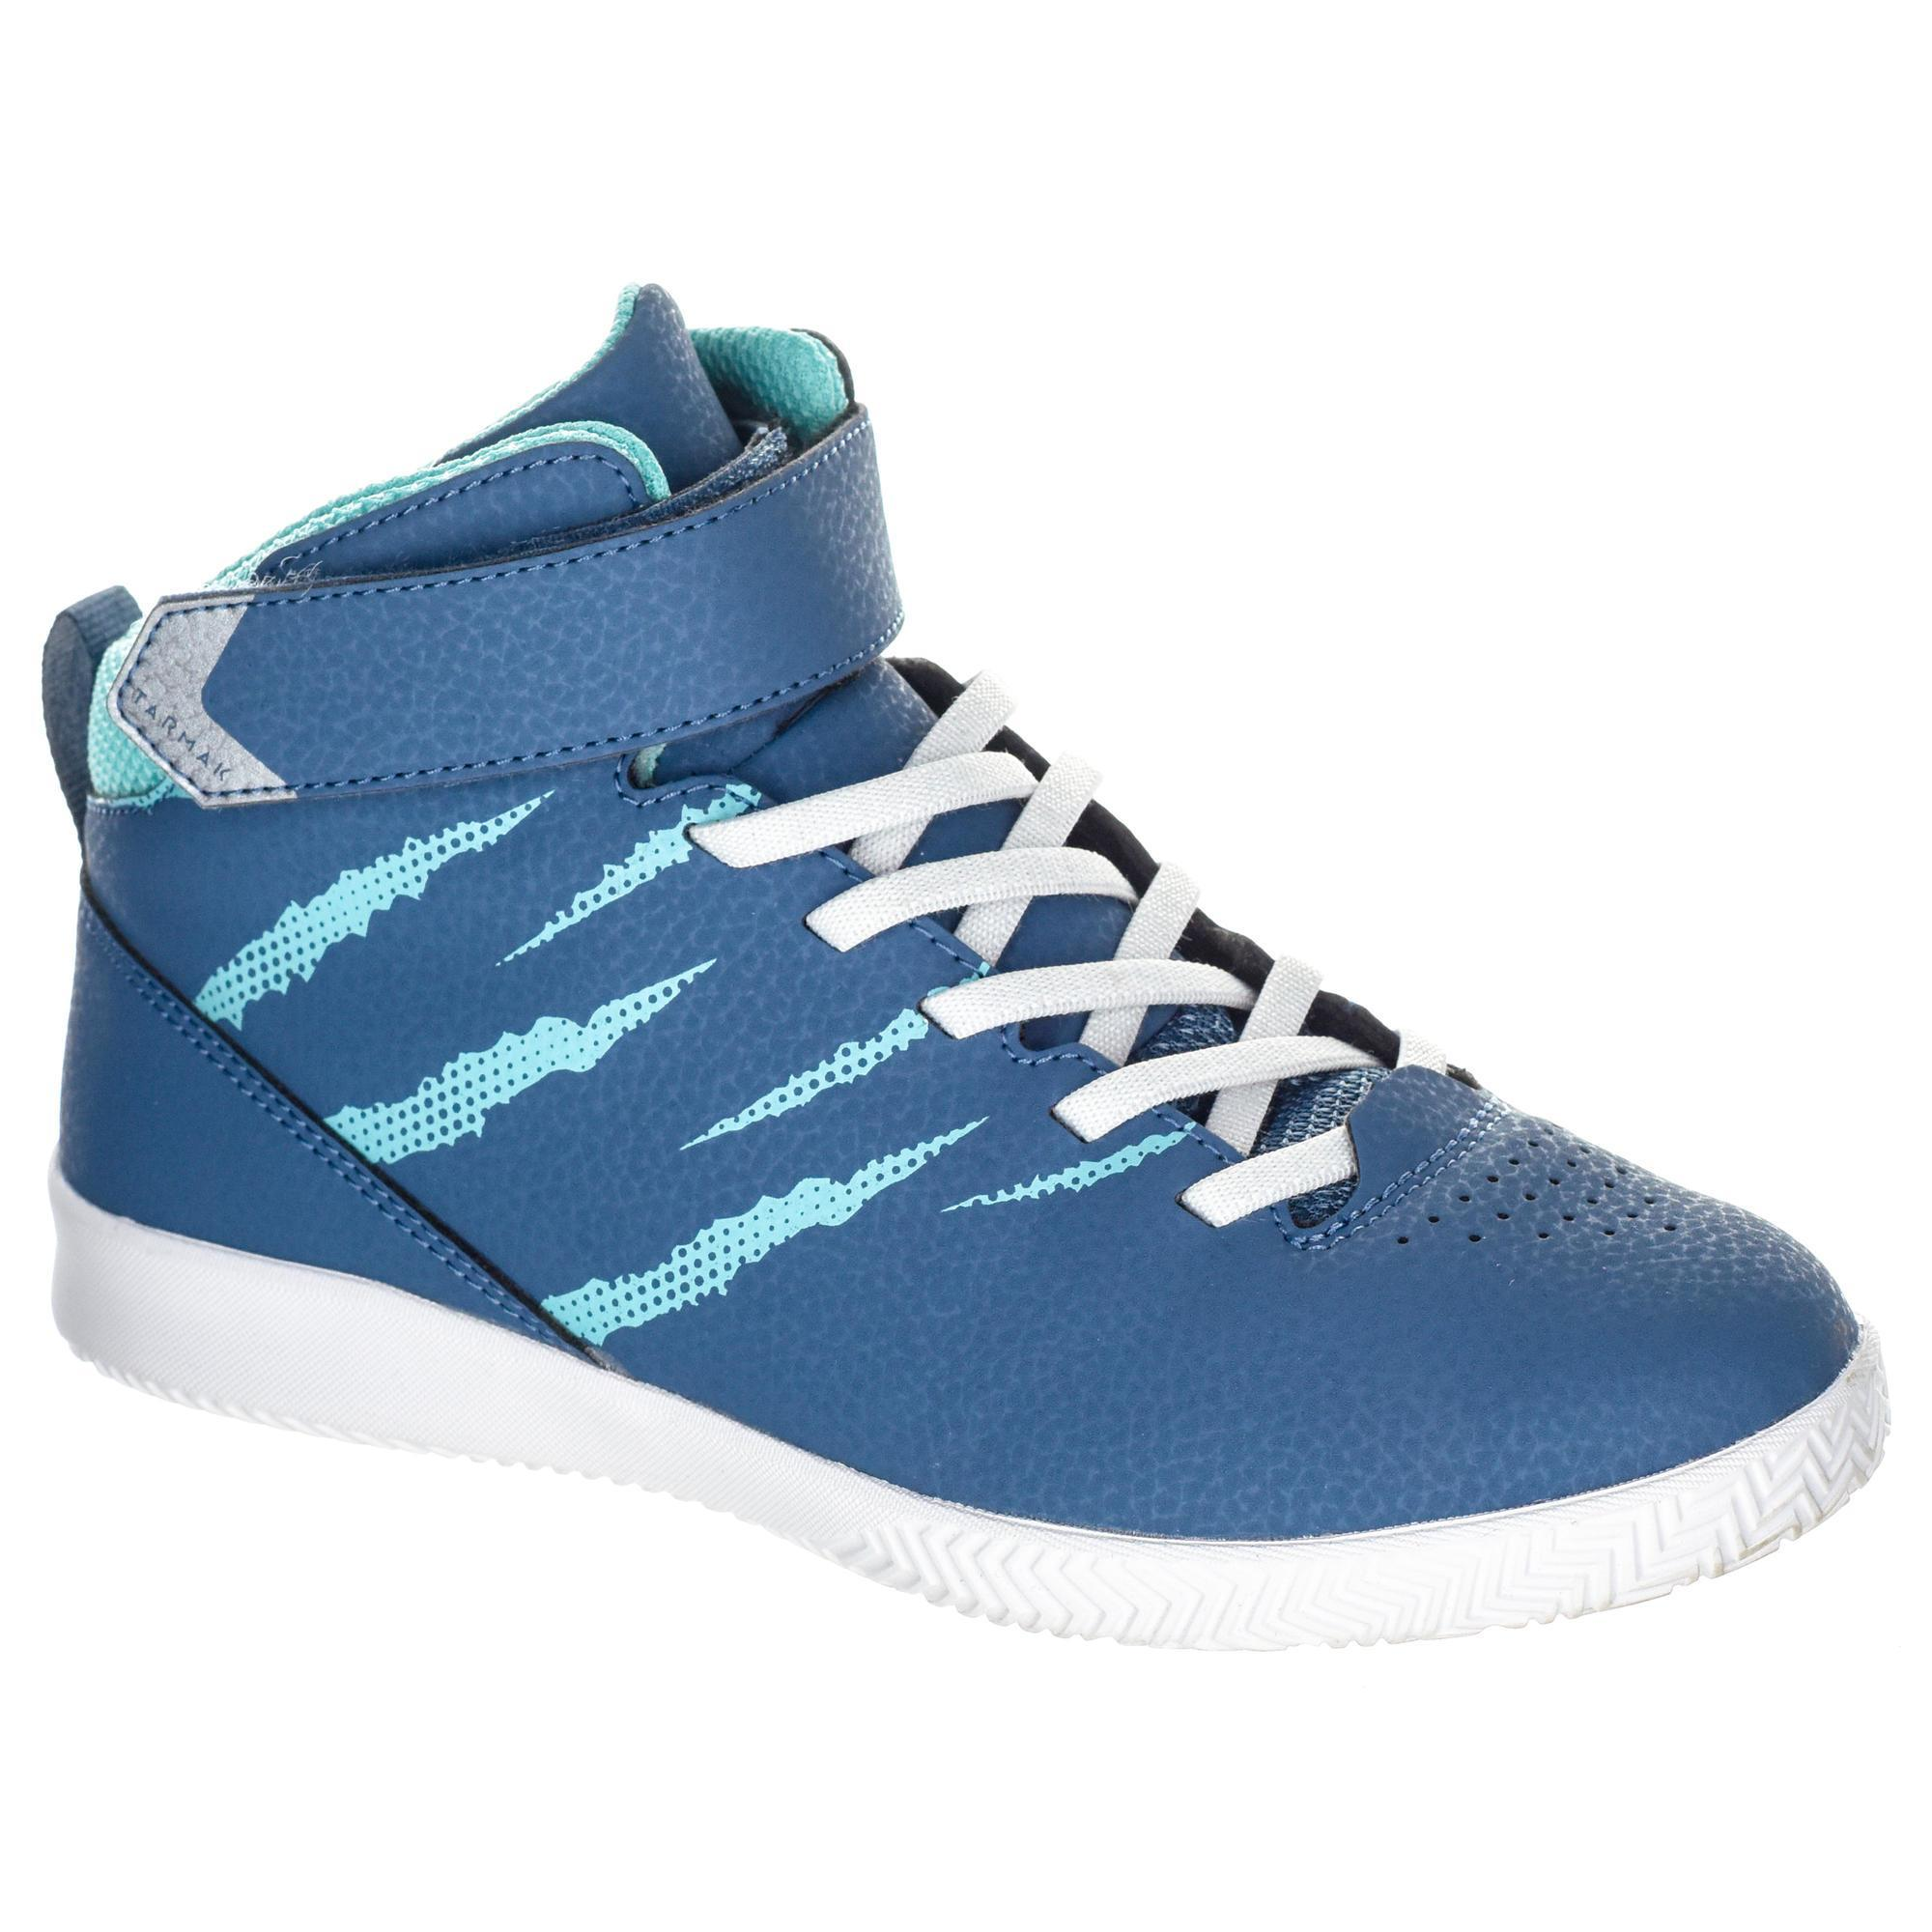 2579239 Tarmak Basketbalschoenen SE100 dames beginners blauw turquoise